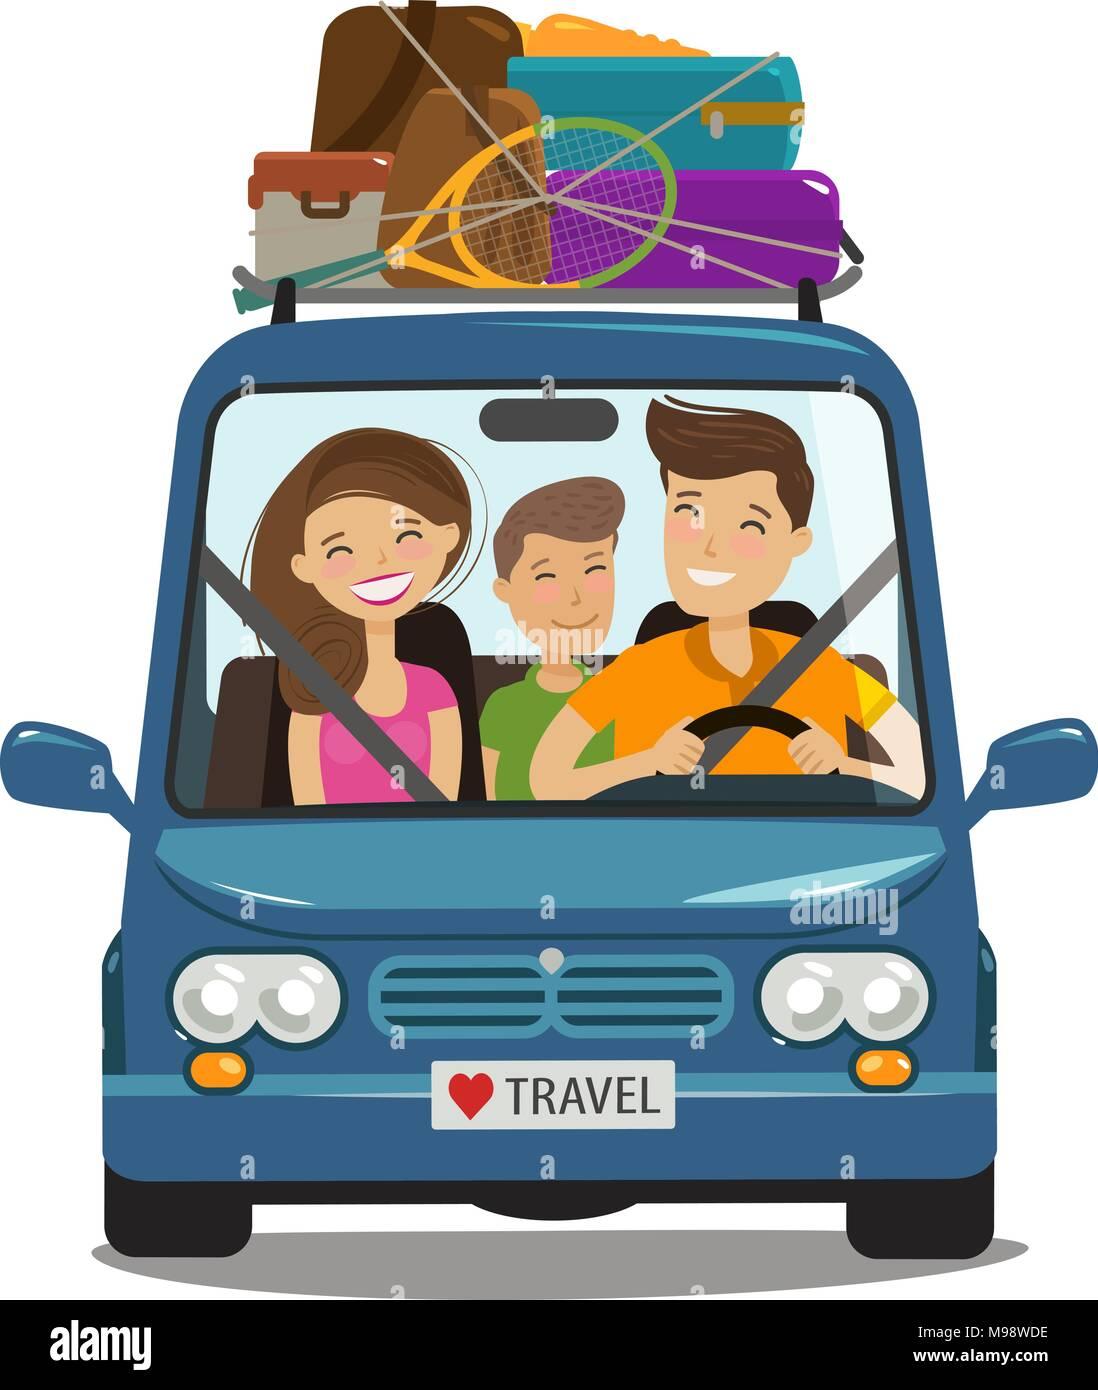 Travel, journey concept. Happy family rides in minivan. Cartoon vector illustration - Stock Image